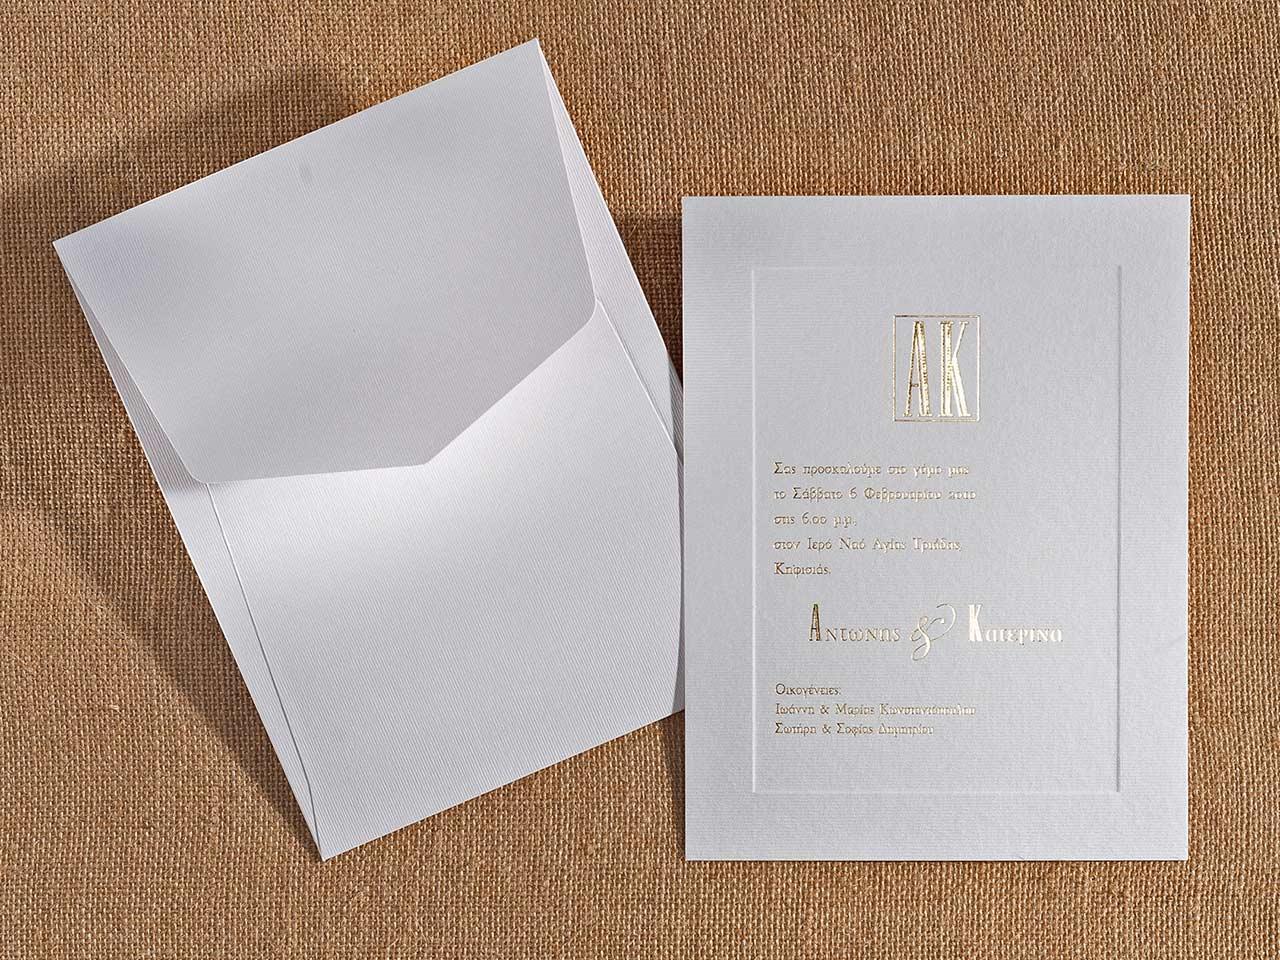 9945eba6b173 ... Προσκλητήριο Γάμου Λευκός Φάκελος με Χρυσοτυπία. 🔍.  prosklitirio-gamou-leukos-rige-fakelos-me-xrisotipia-bin-